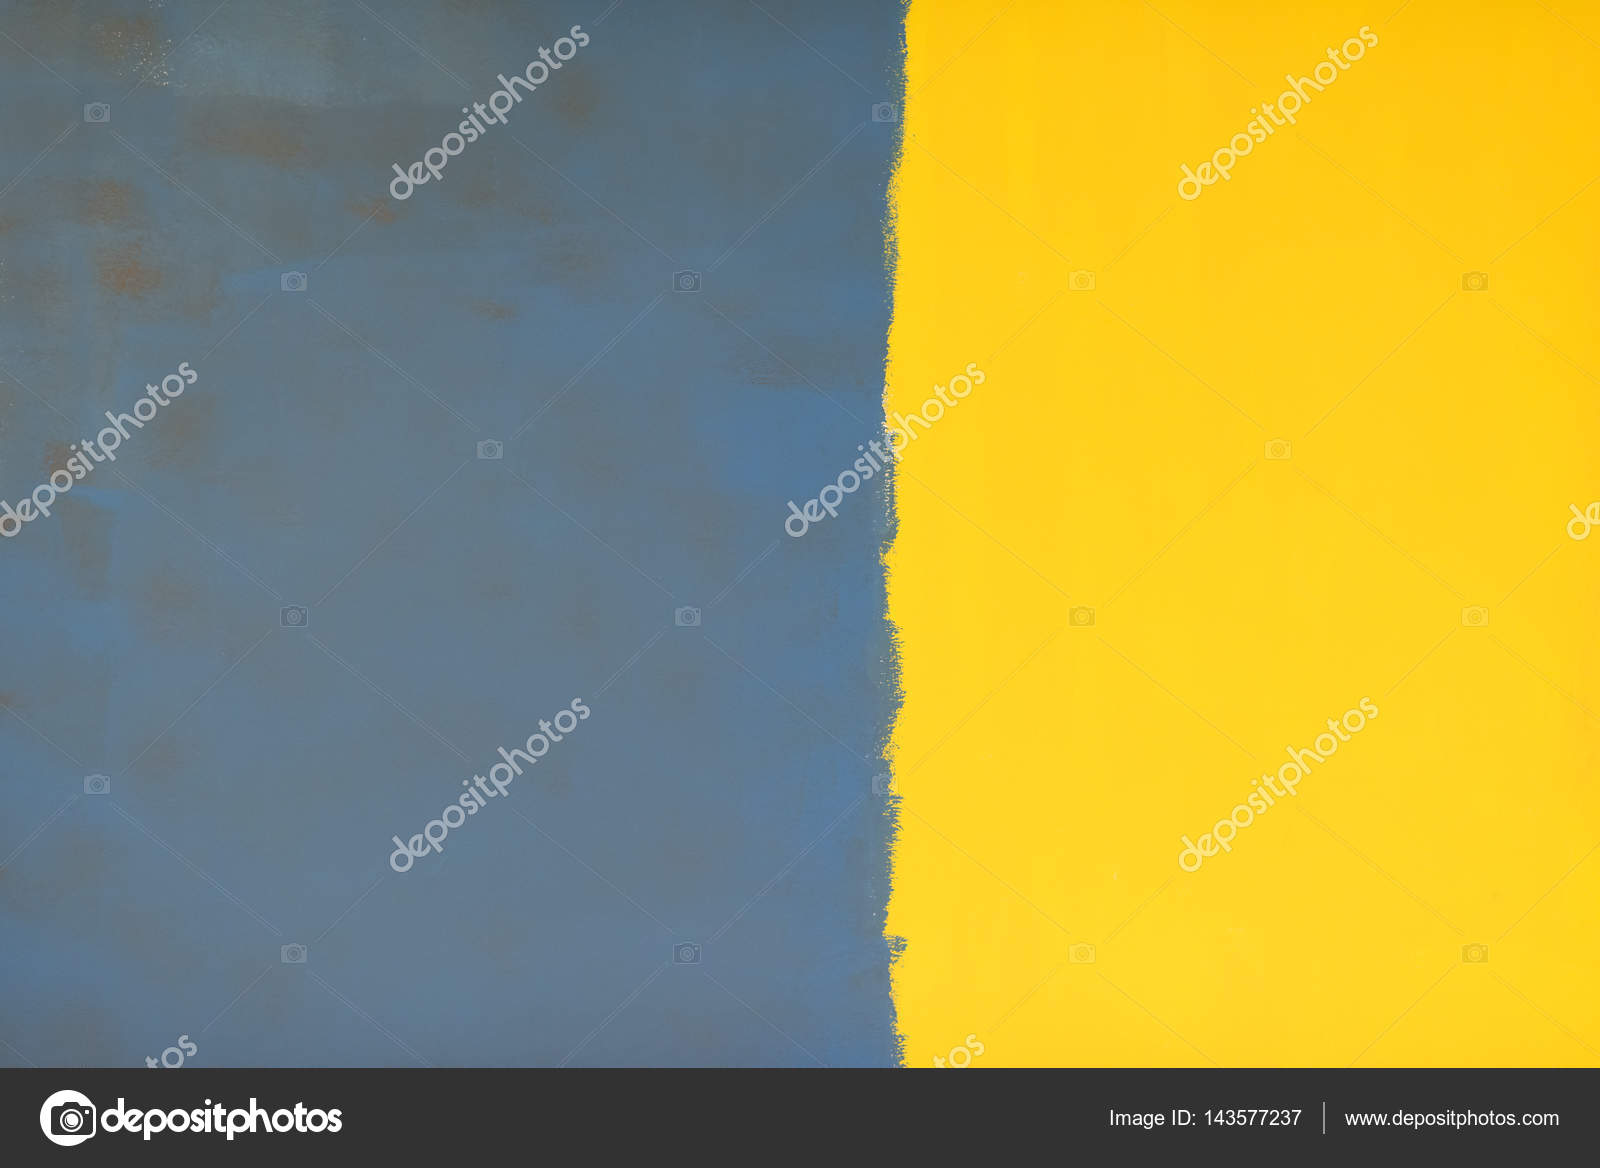 Half Geschilderde Muur : Half geschilderde muur u stockfoto shock